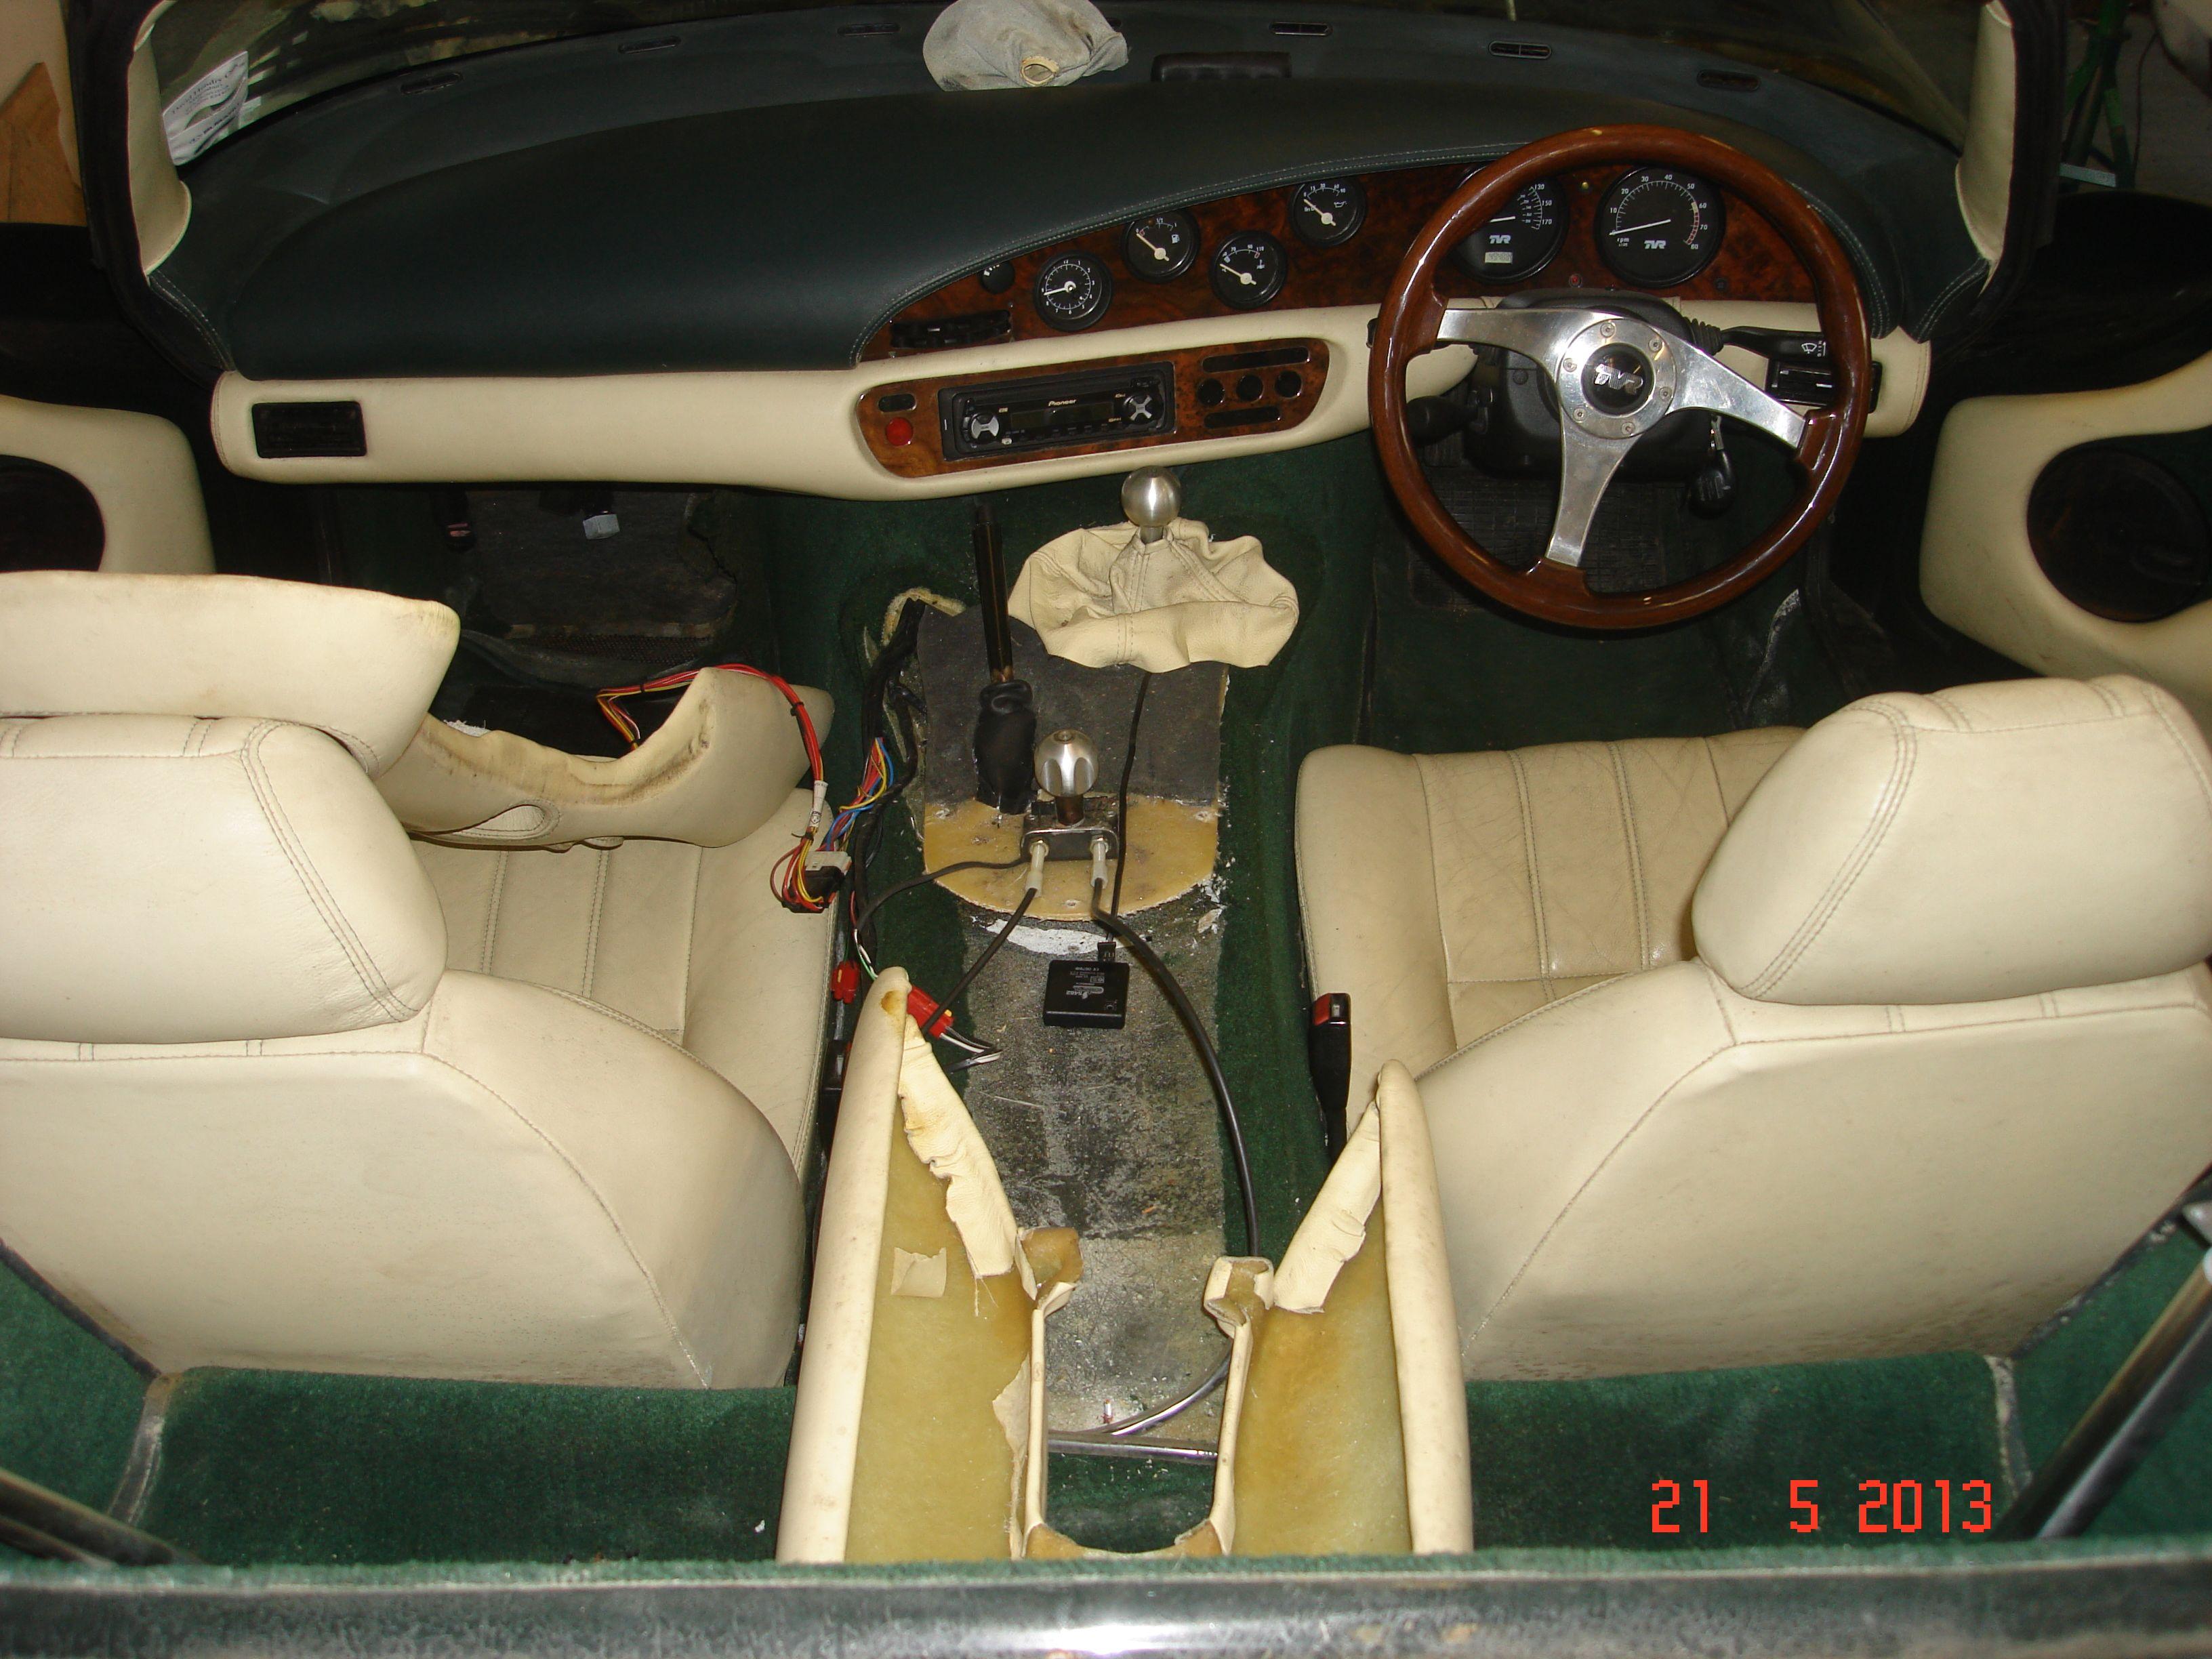 chimaera tvr engineering all car models page 3. Black Bedroom Furniture Sets. Home Design Ideas